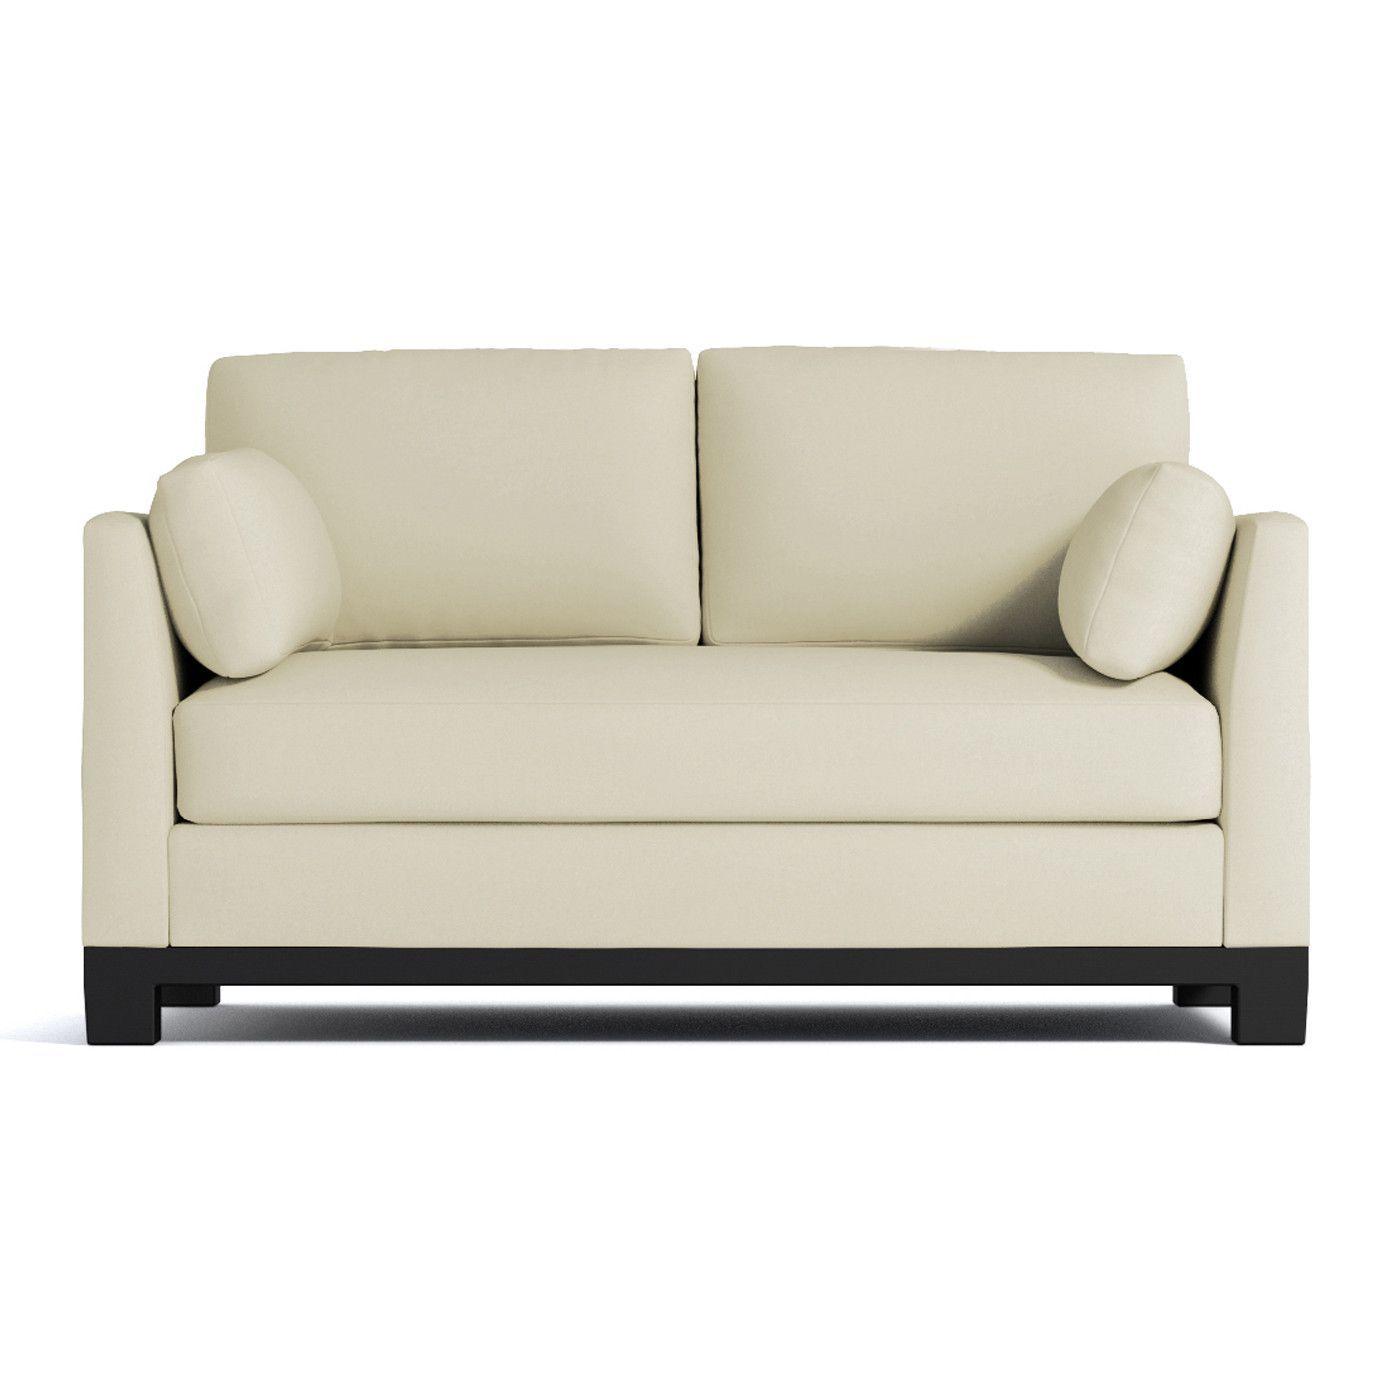 Pin On Contemporary Sofas